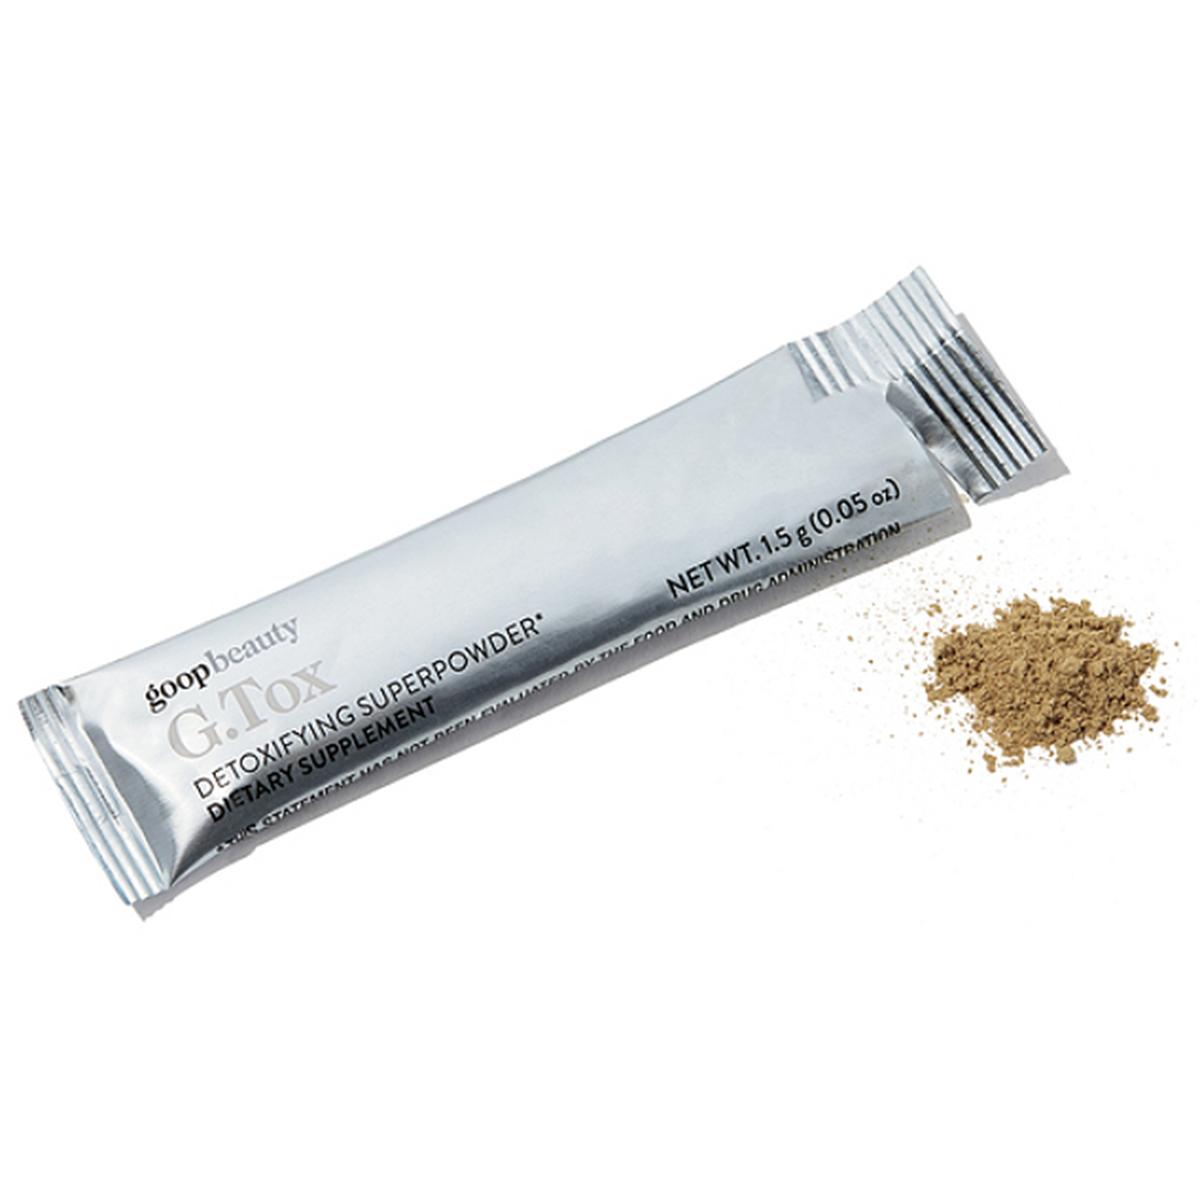 G.Tox Detoxifying Superpowder